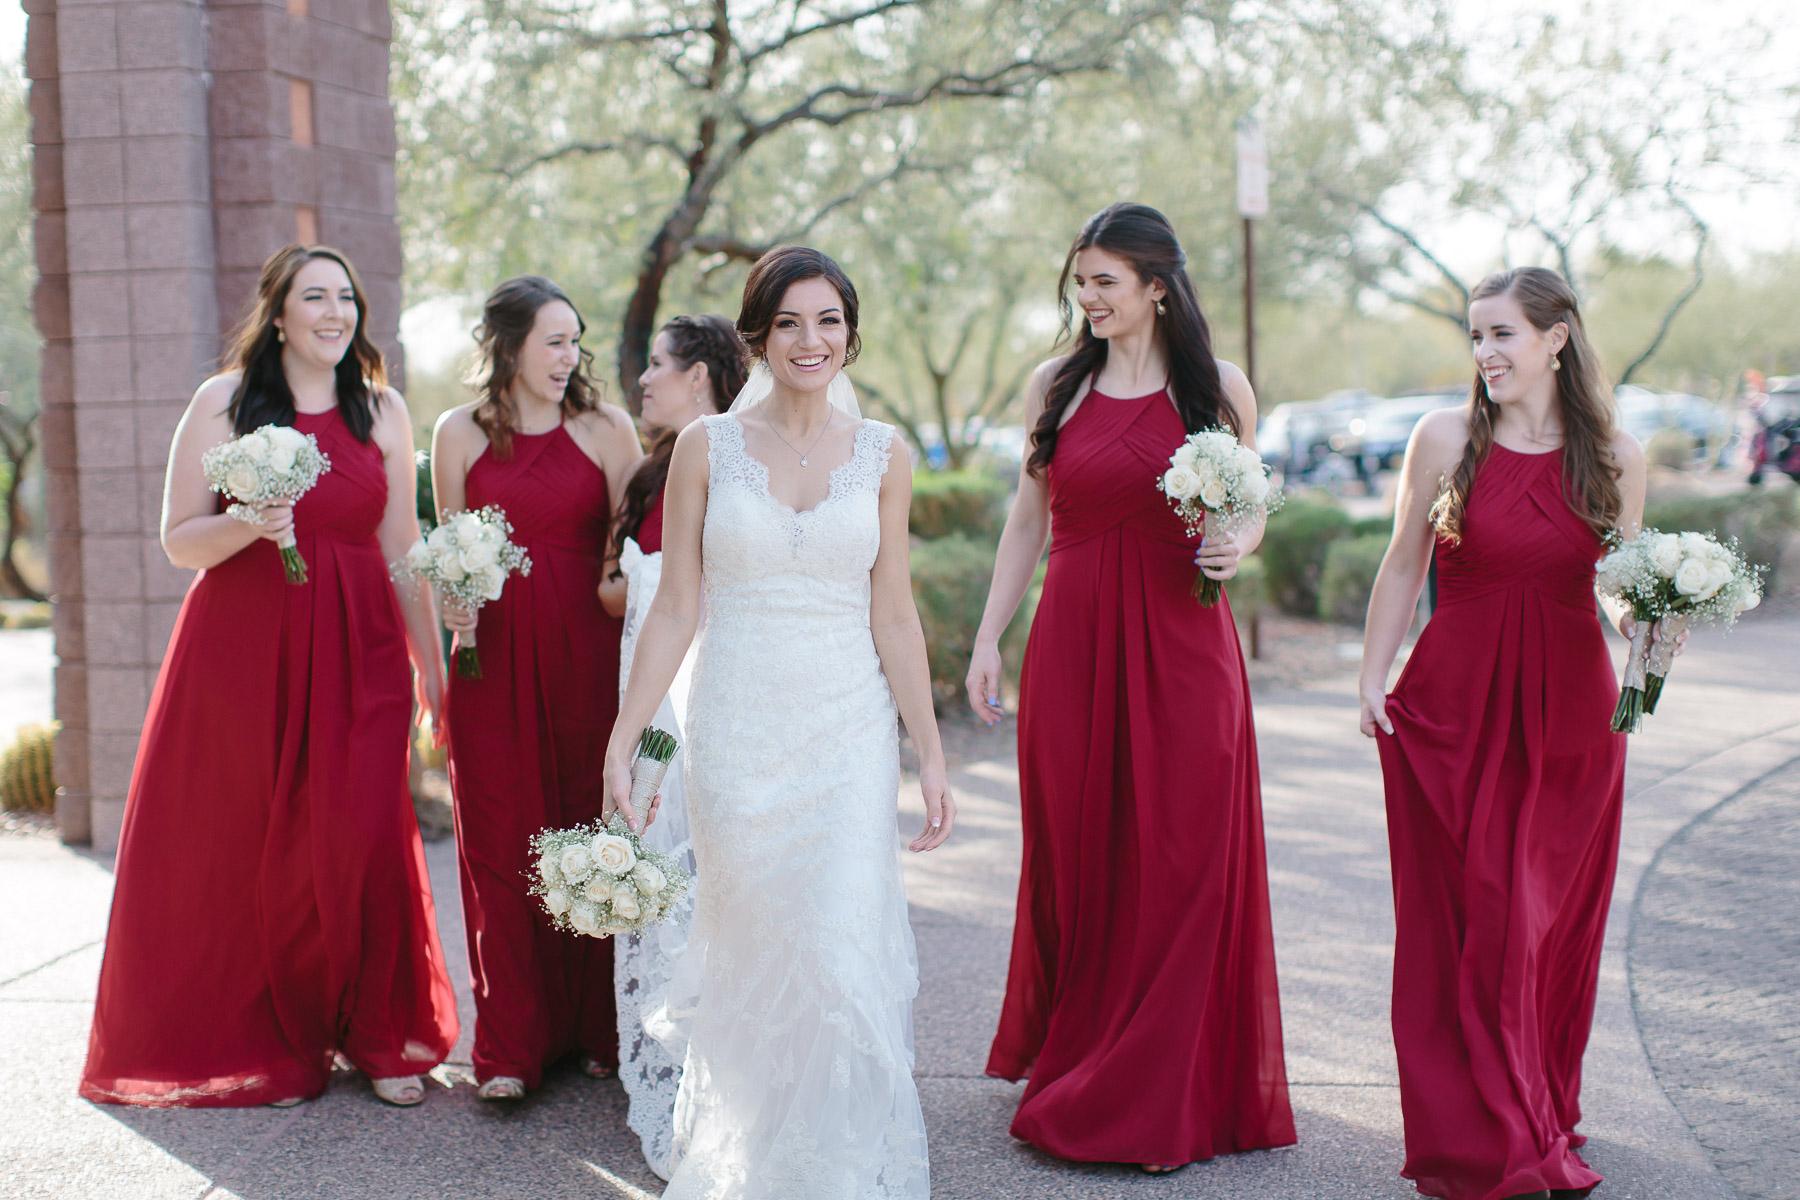 161210-Luxium-Weddings-Arizona-Matt-Jenny-Anthem-Golf-Country-Club-1016.jpg